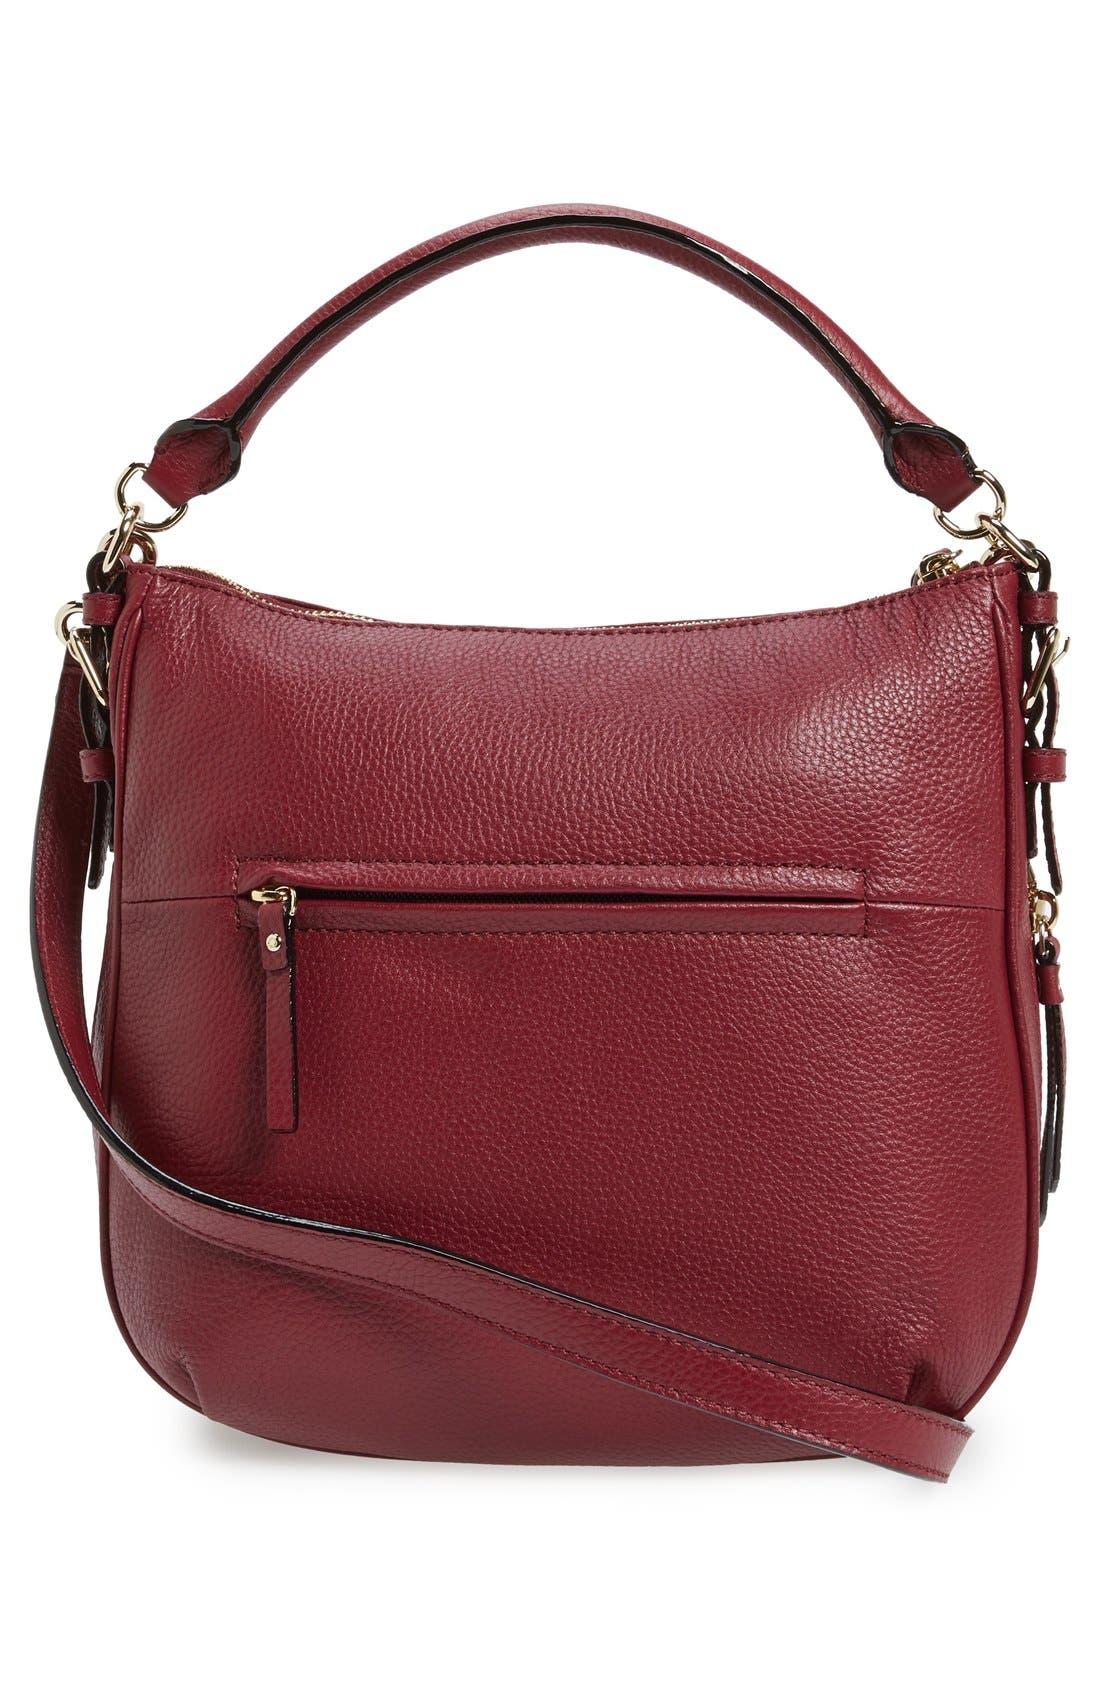 Alternate Image 3  - kate spade new york 'cobble hill - small ella' leather satchel